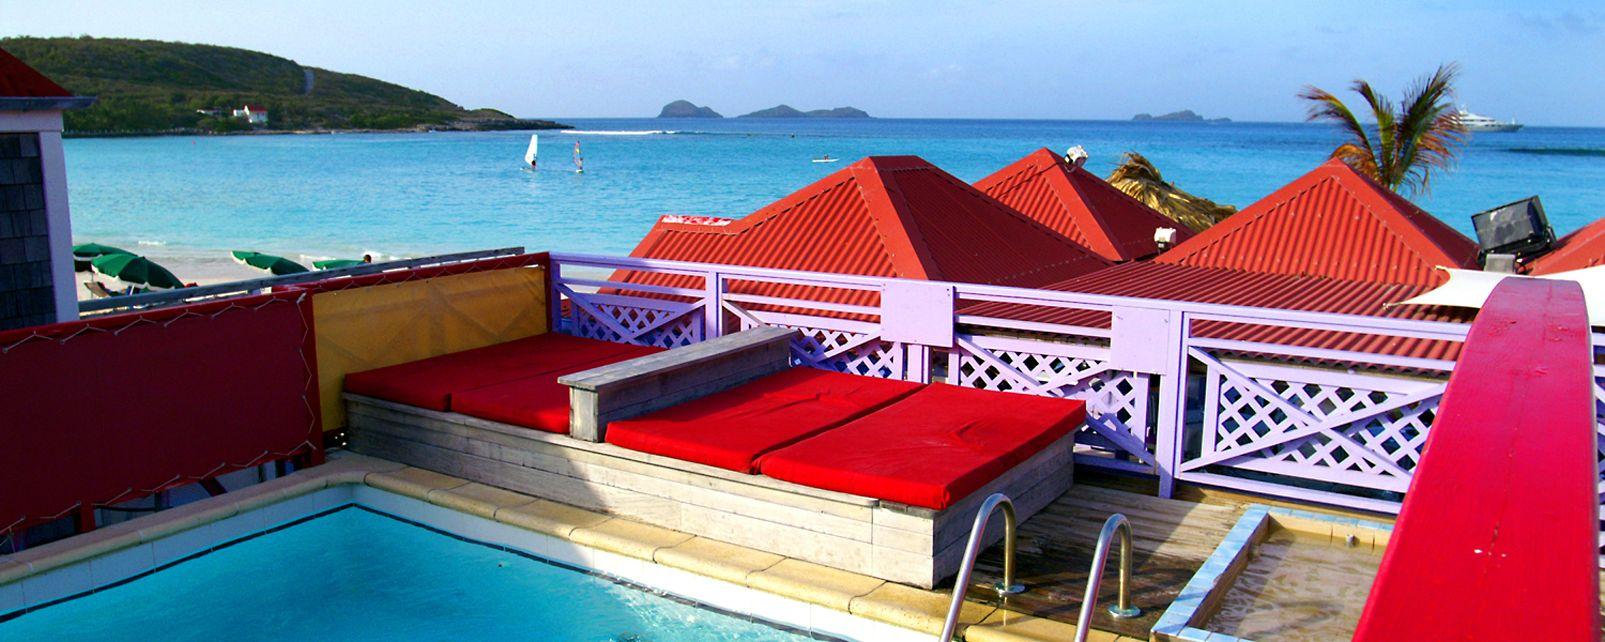 Hotel Tom Beach Hôtel